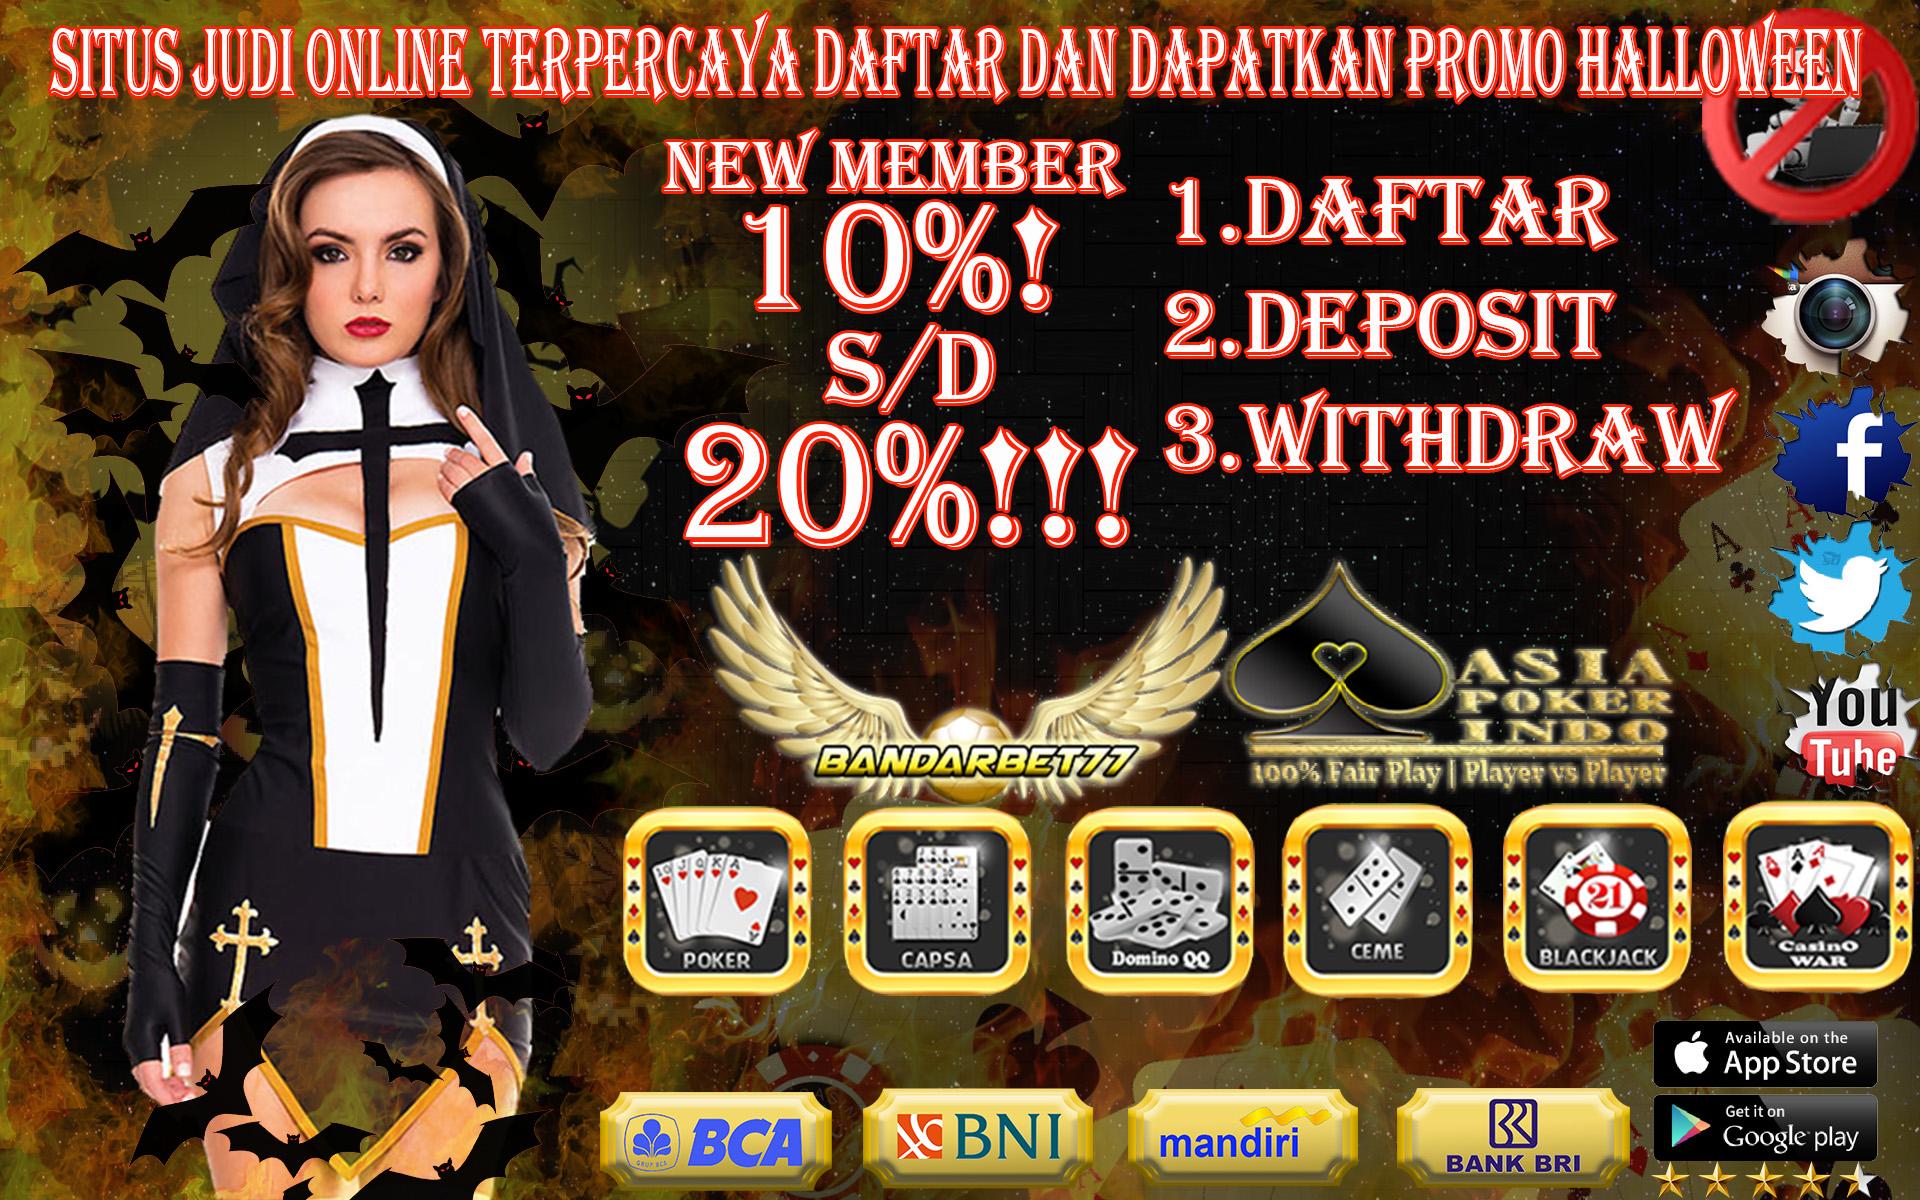 Daftar Agen Poker Zynga Online Rahasia Indonesia